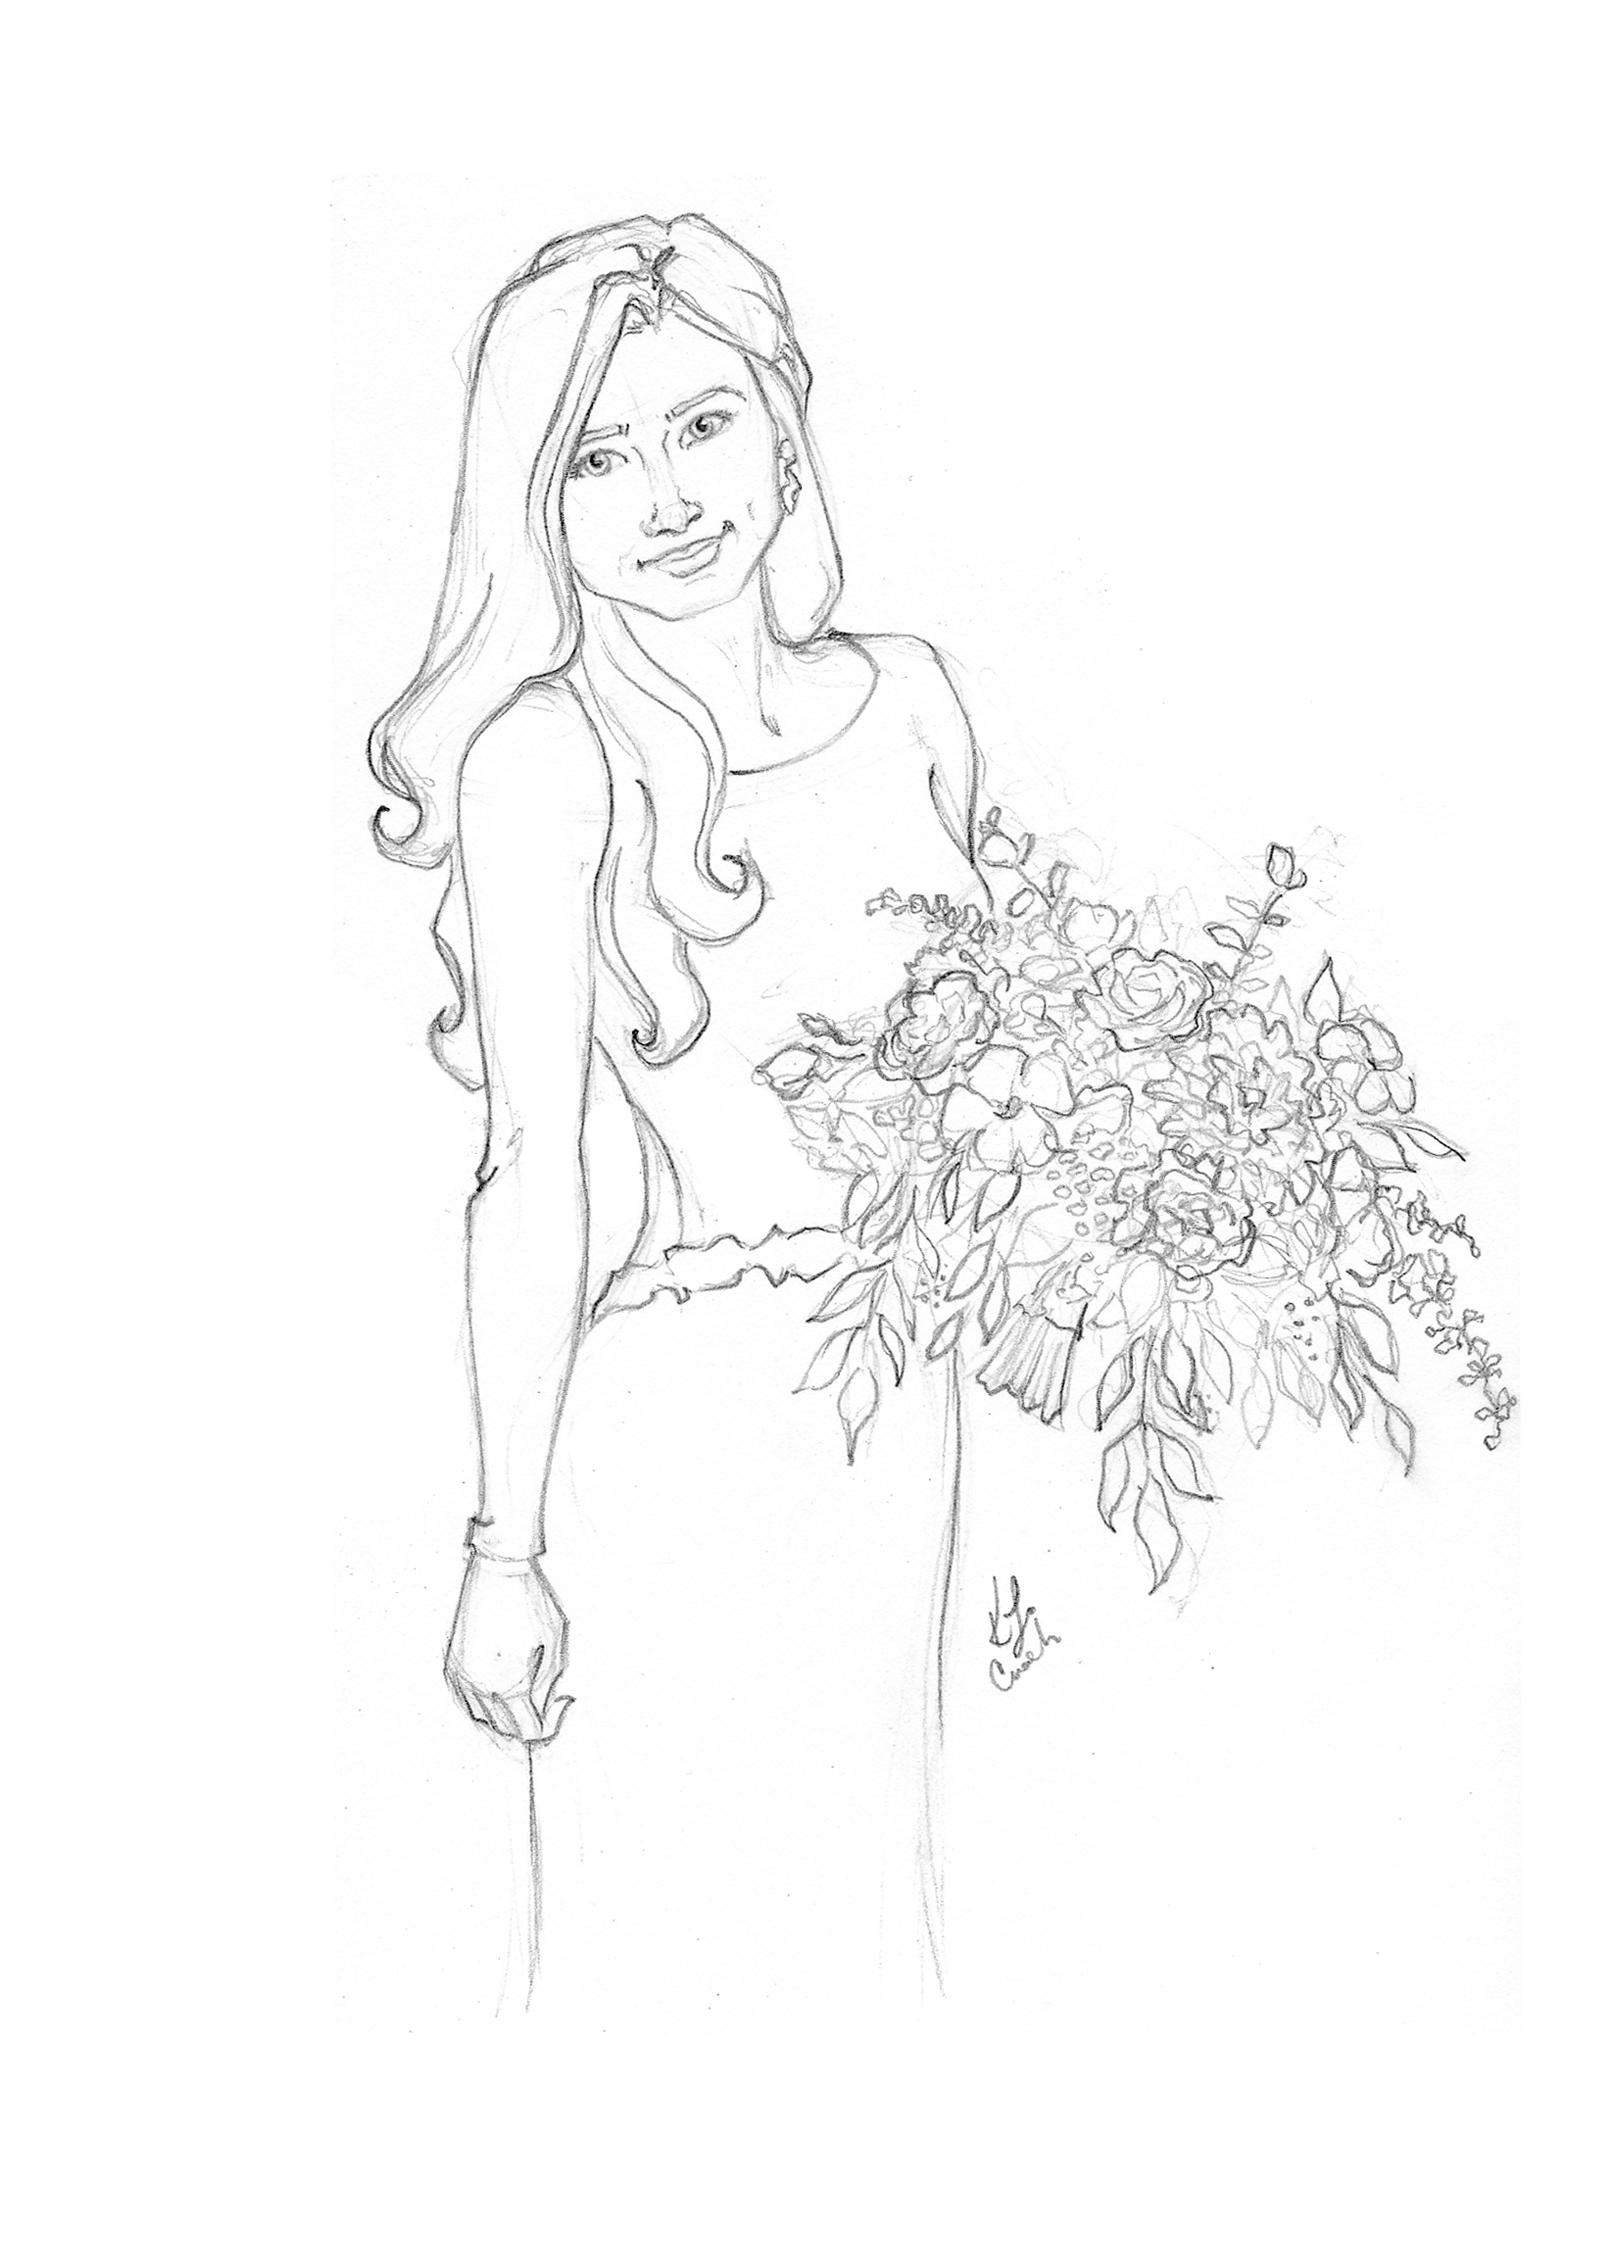 Custom bridal portrait sketch. Fine art bridal portrait for a unique anniversary gift. #customportrait #portraitillustration #blusheddesign #portraitsketch